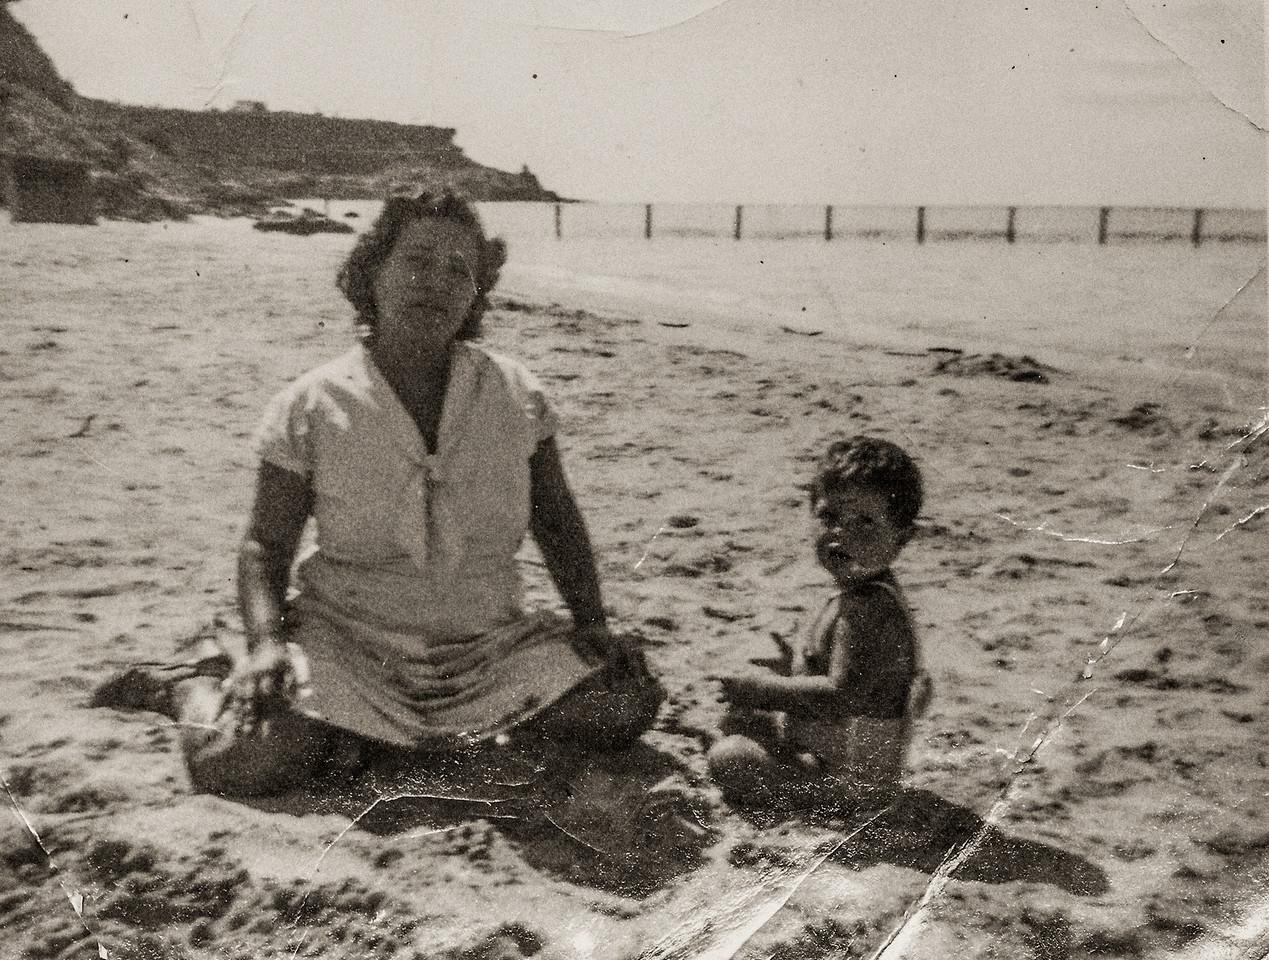 Sort ID: 1950-V03 Image ID: B004 (est) Year: 1950. Photo content: Mother, Fred. Location of photo: On beach, Cardon, Venezuela.